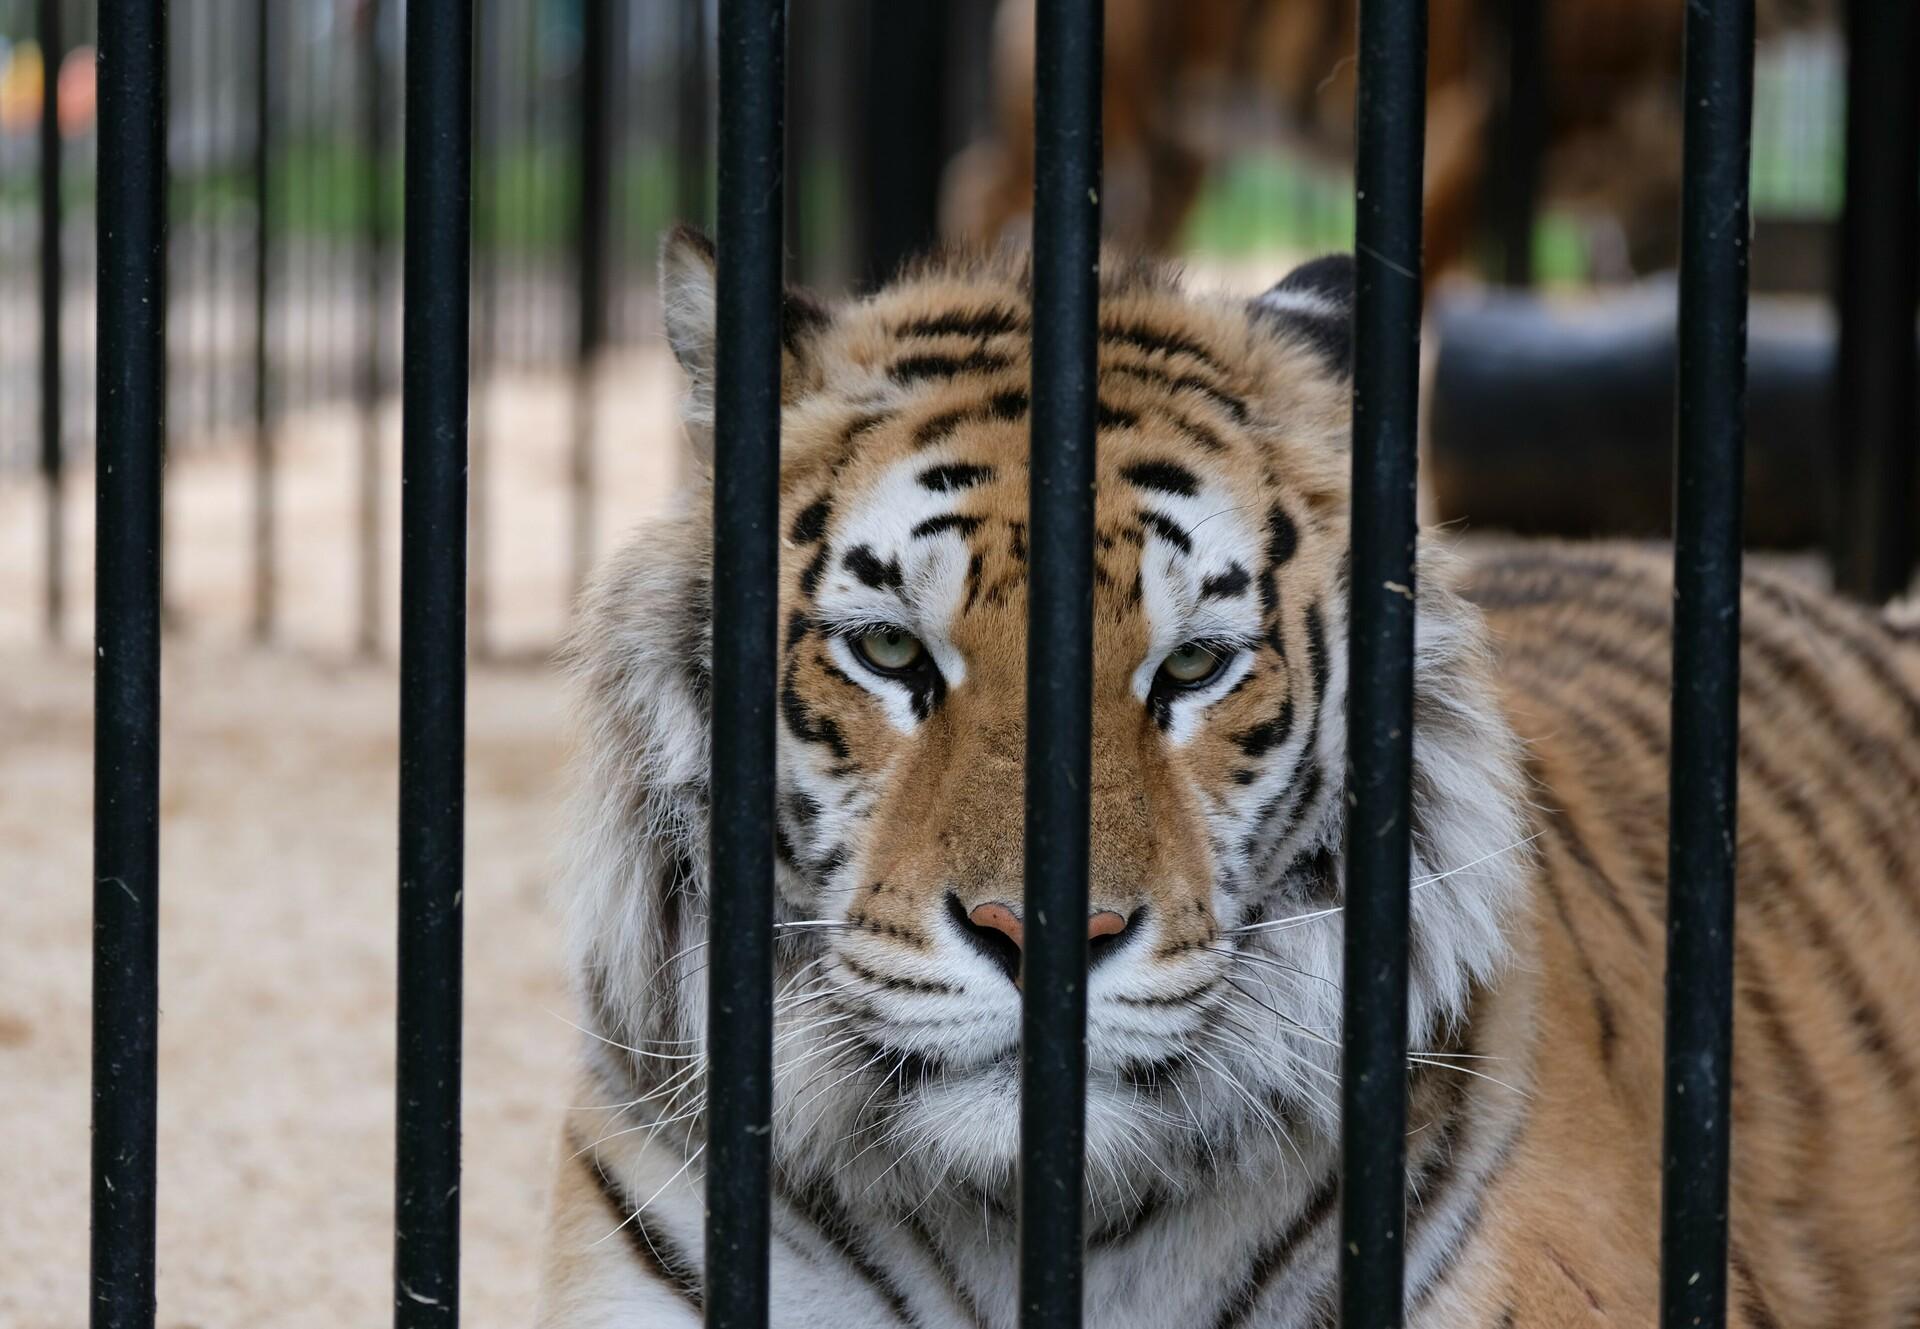 Tiger behind cage bars